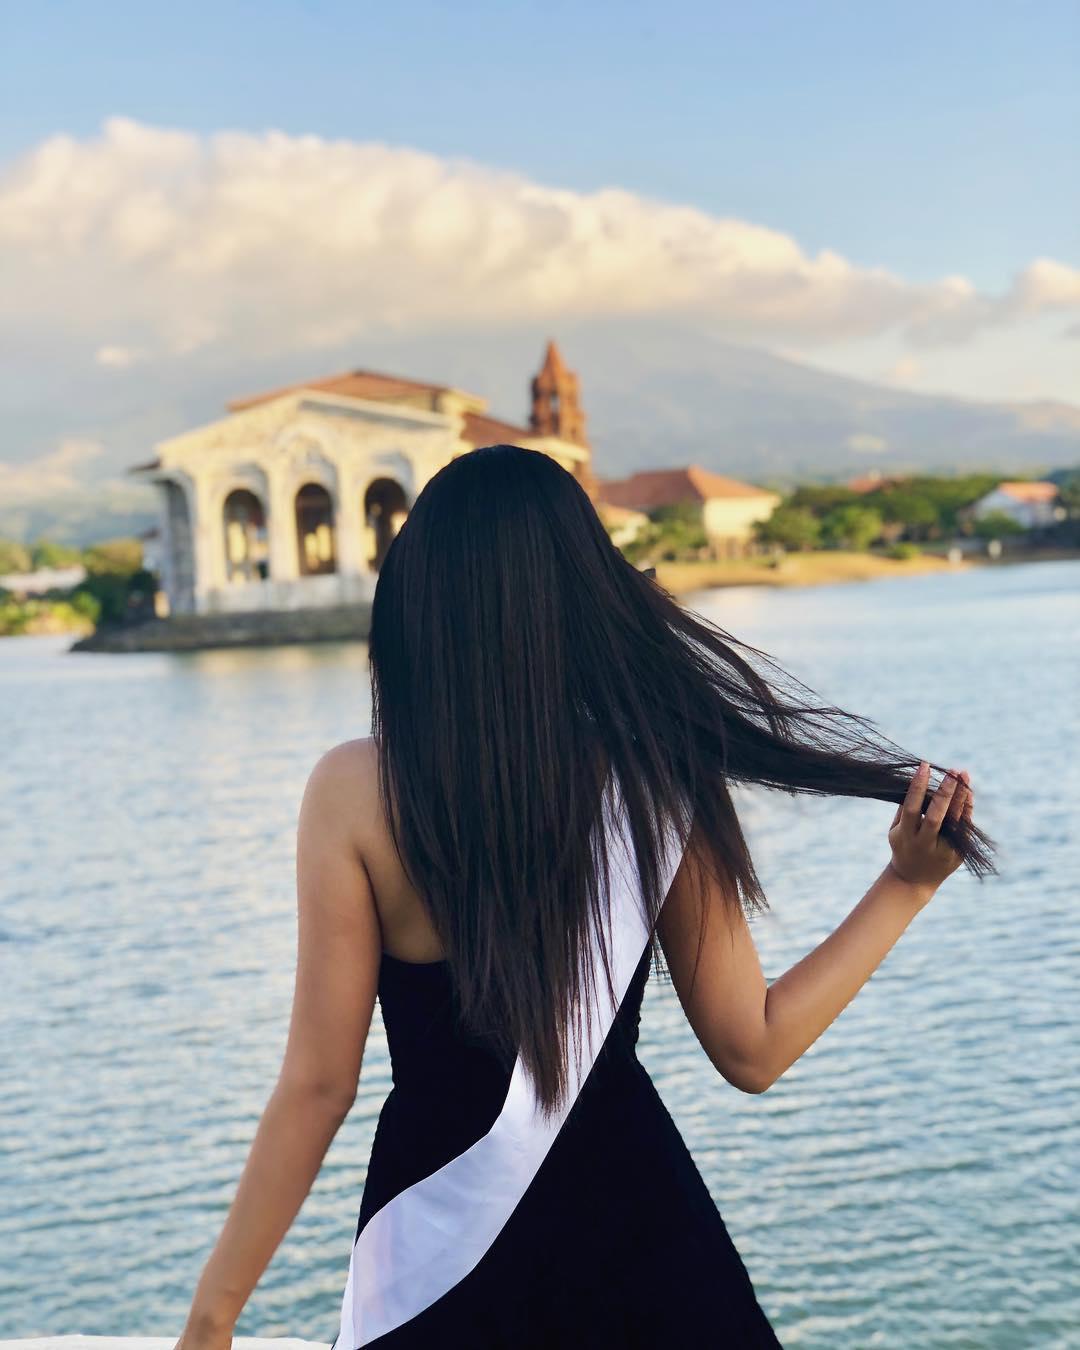 giuliana valenzuela, miss intercontinental peru 2018-2019. - Página 3 49933611